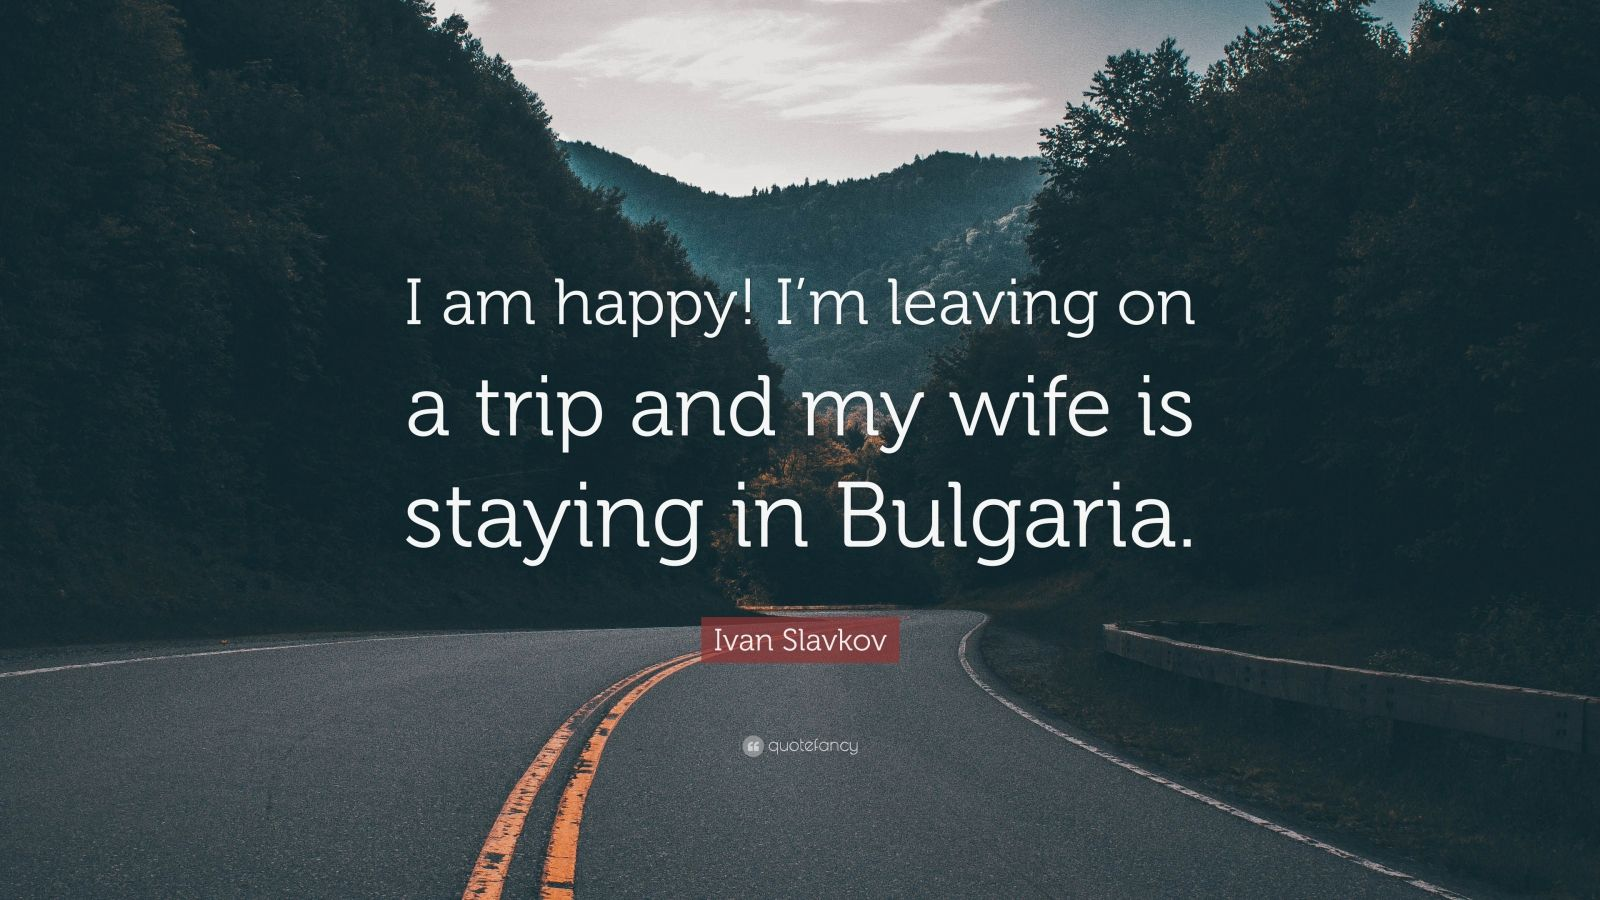 Ivan Slavkov Quote: I am happy! Im leaving on a trip and